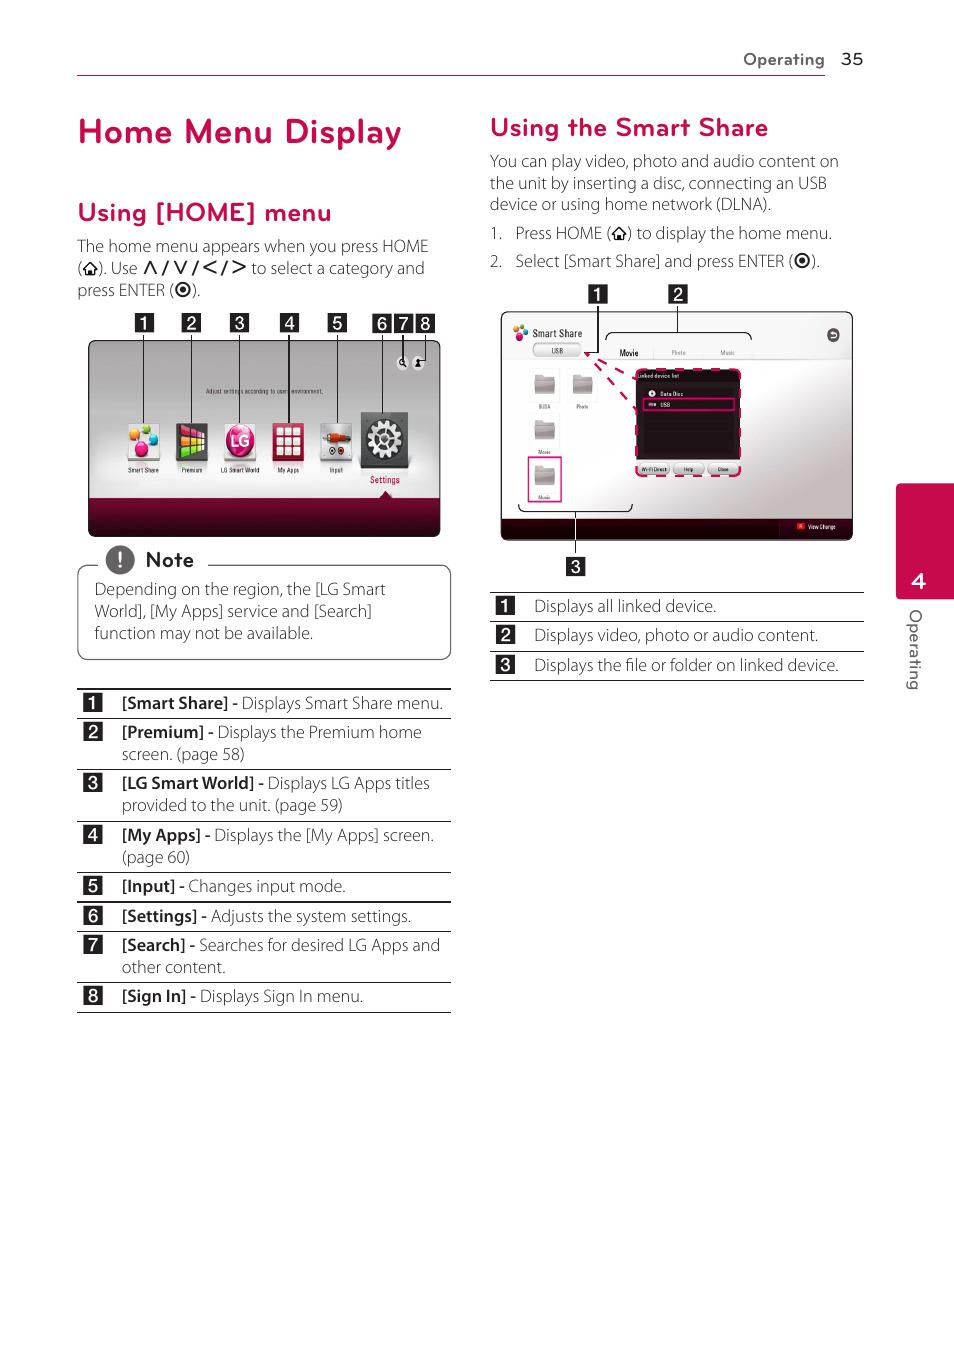 Home menu display, Using [home] menu, Using the smart share